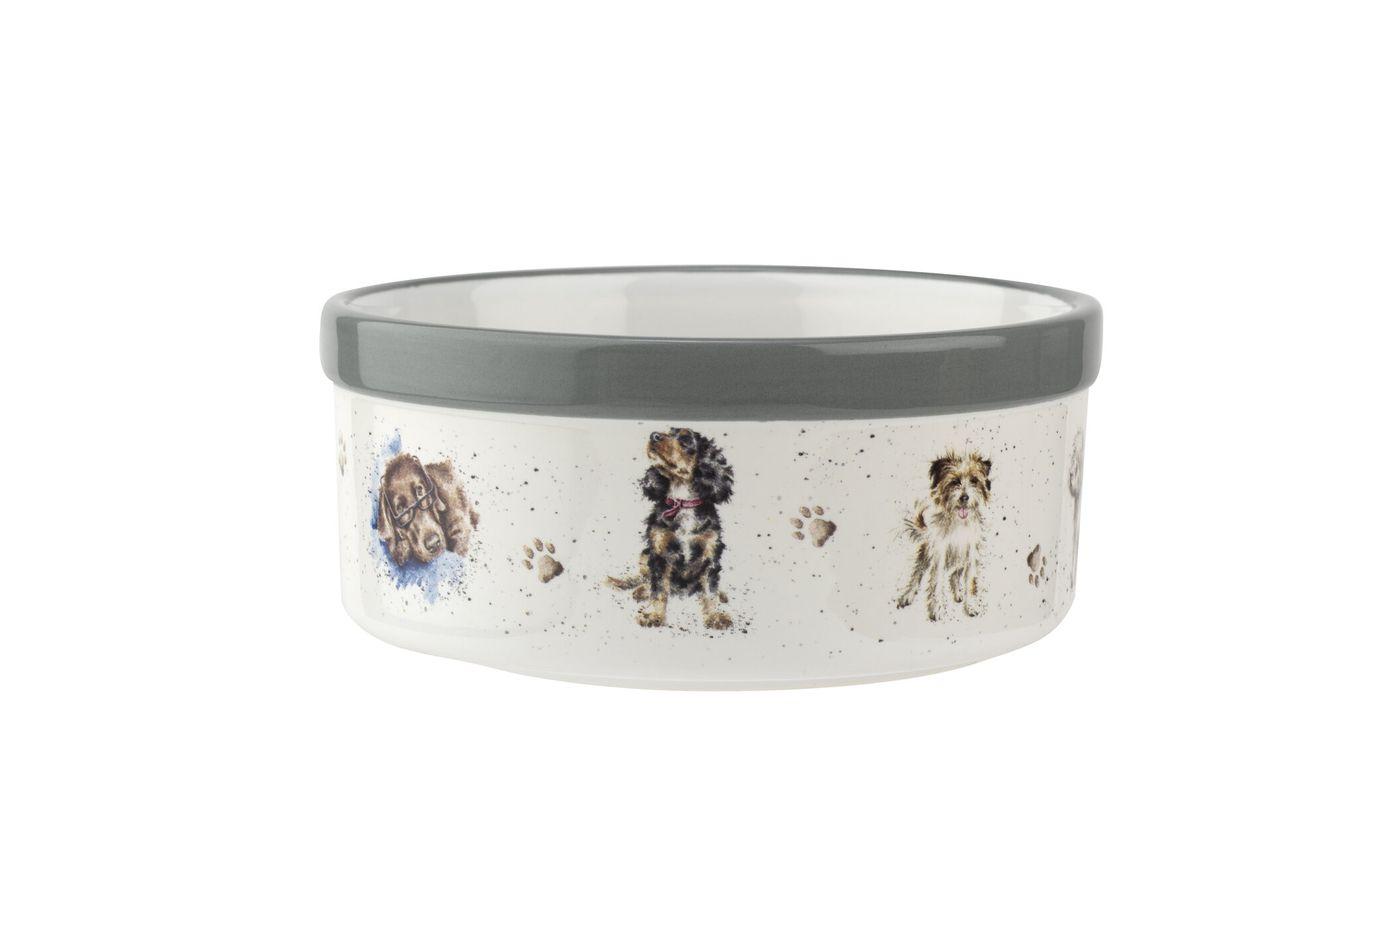 Royal Worcester Wrendale Designs Pet Bowl 15.4cm thumb 3